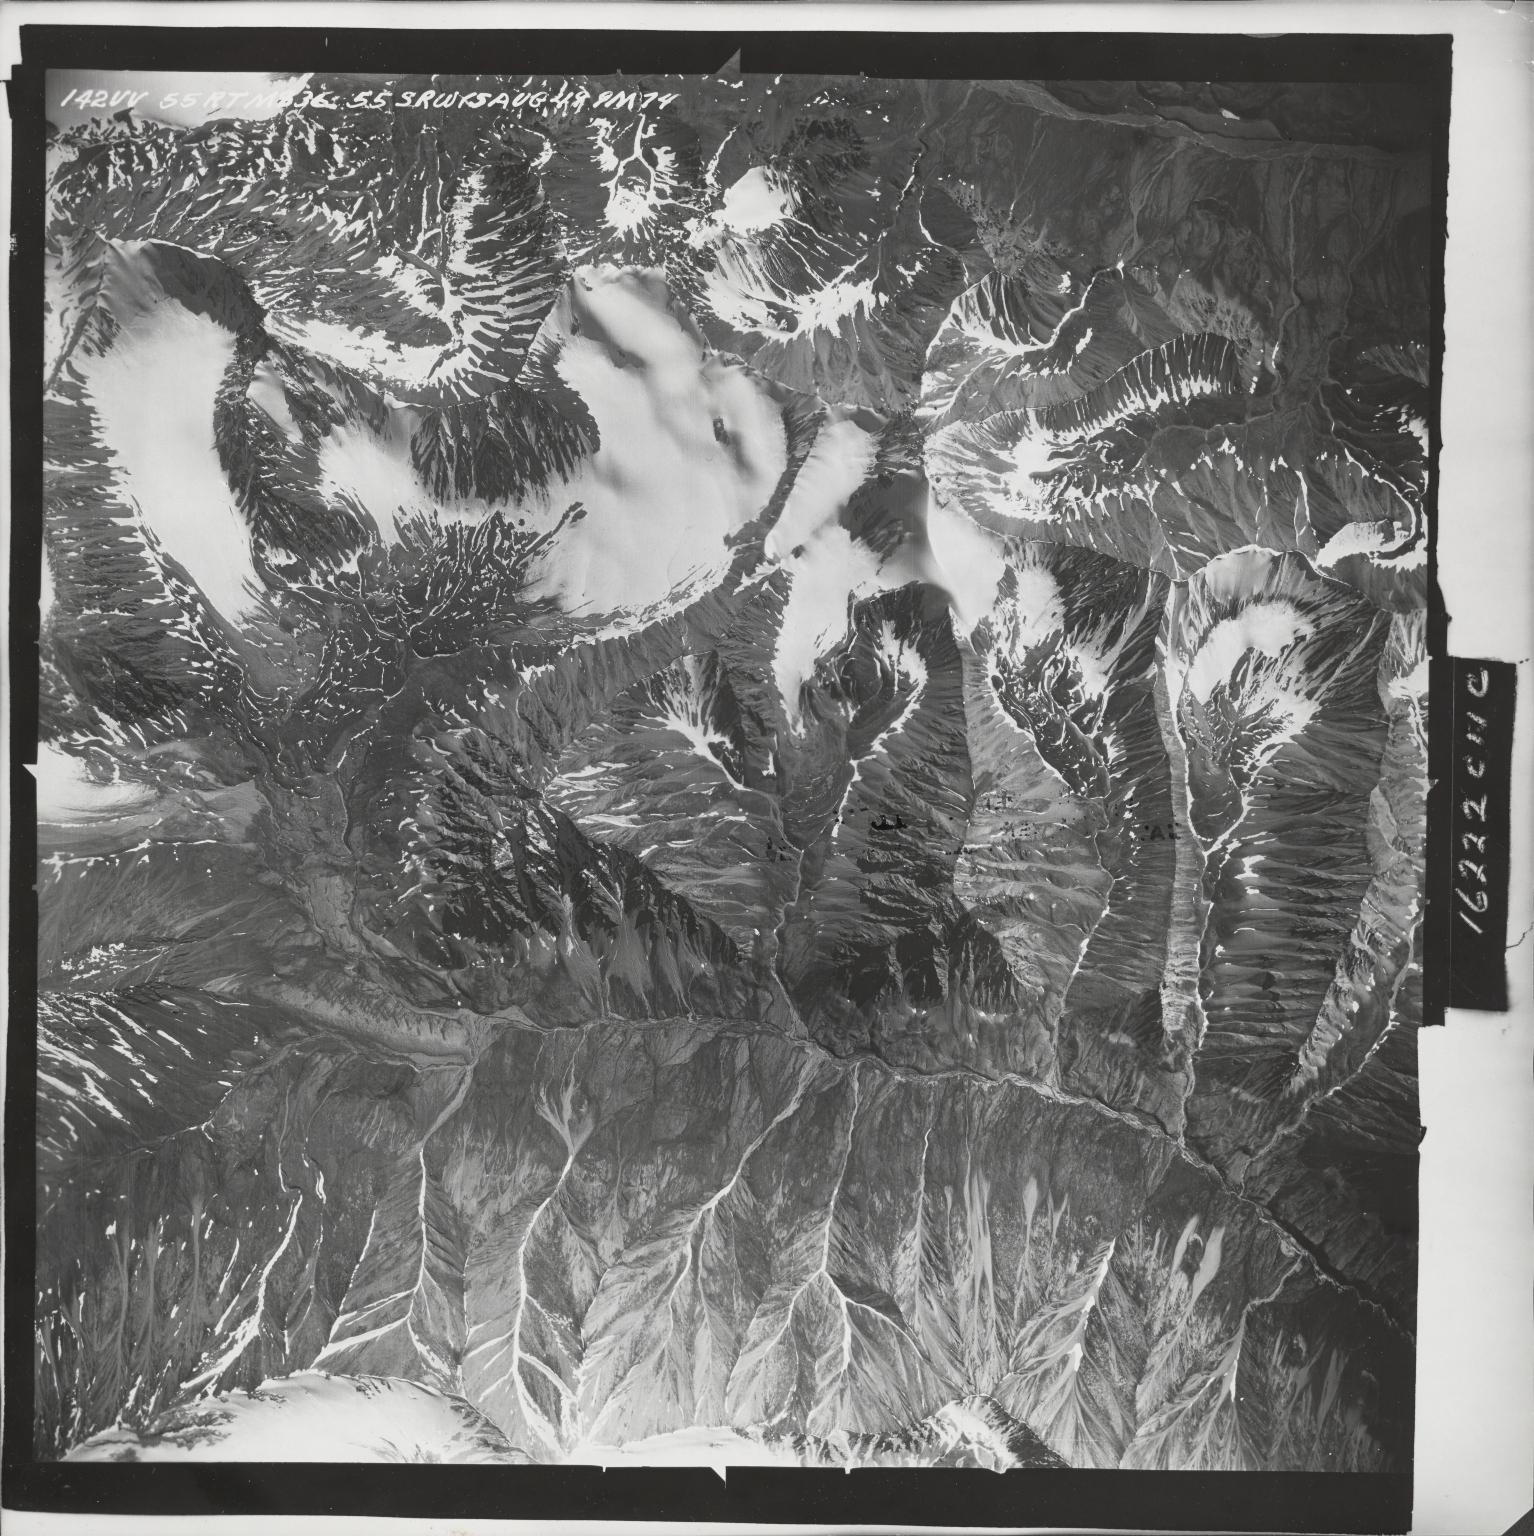 Talkeetna Mountains, aerial photograph M 836 142, Alaska